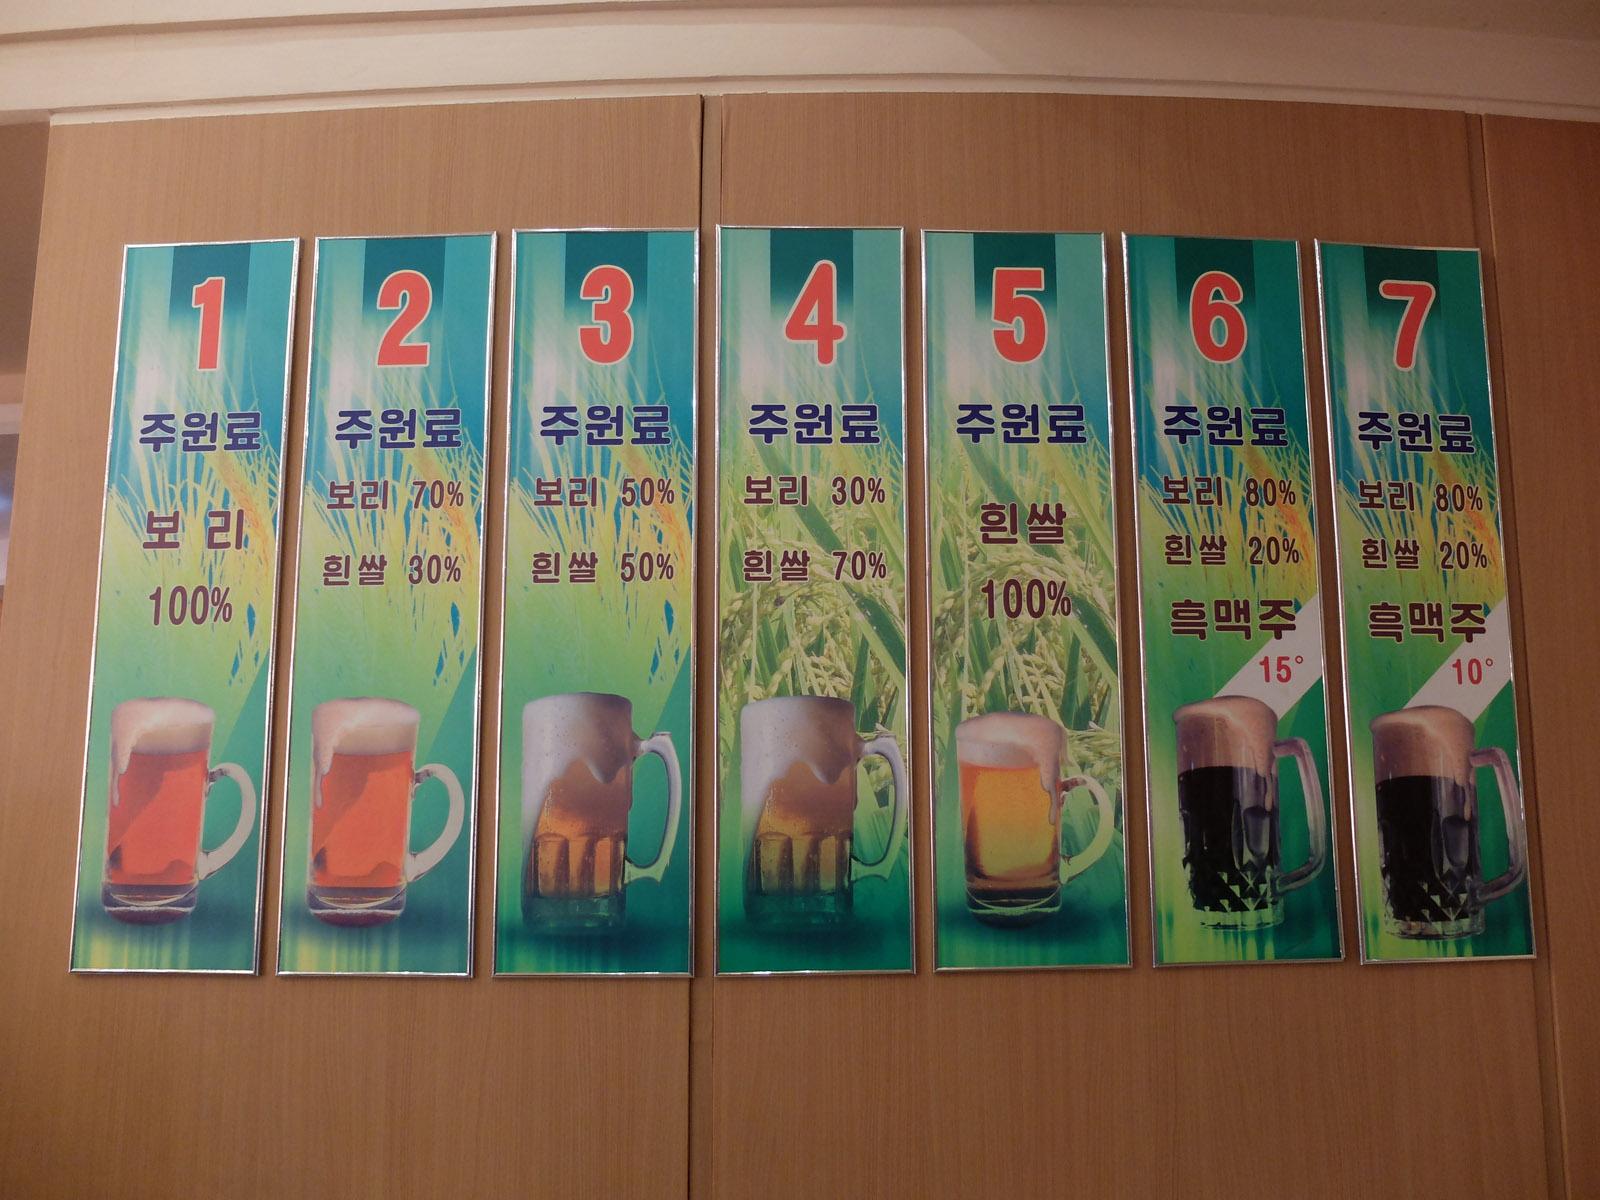 Сорта пива Taedonggang. Фото: Munchies